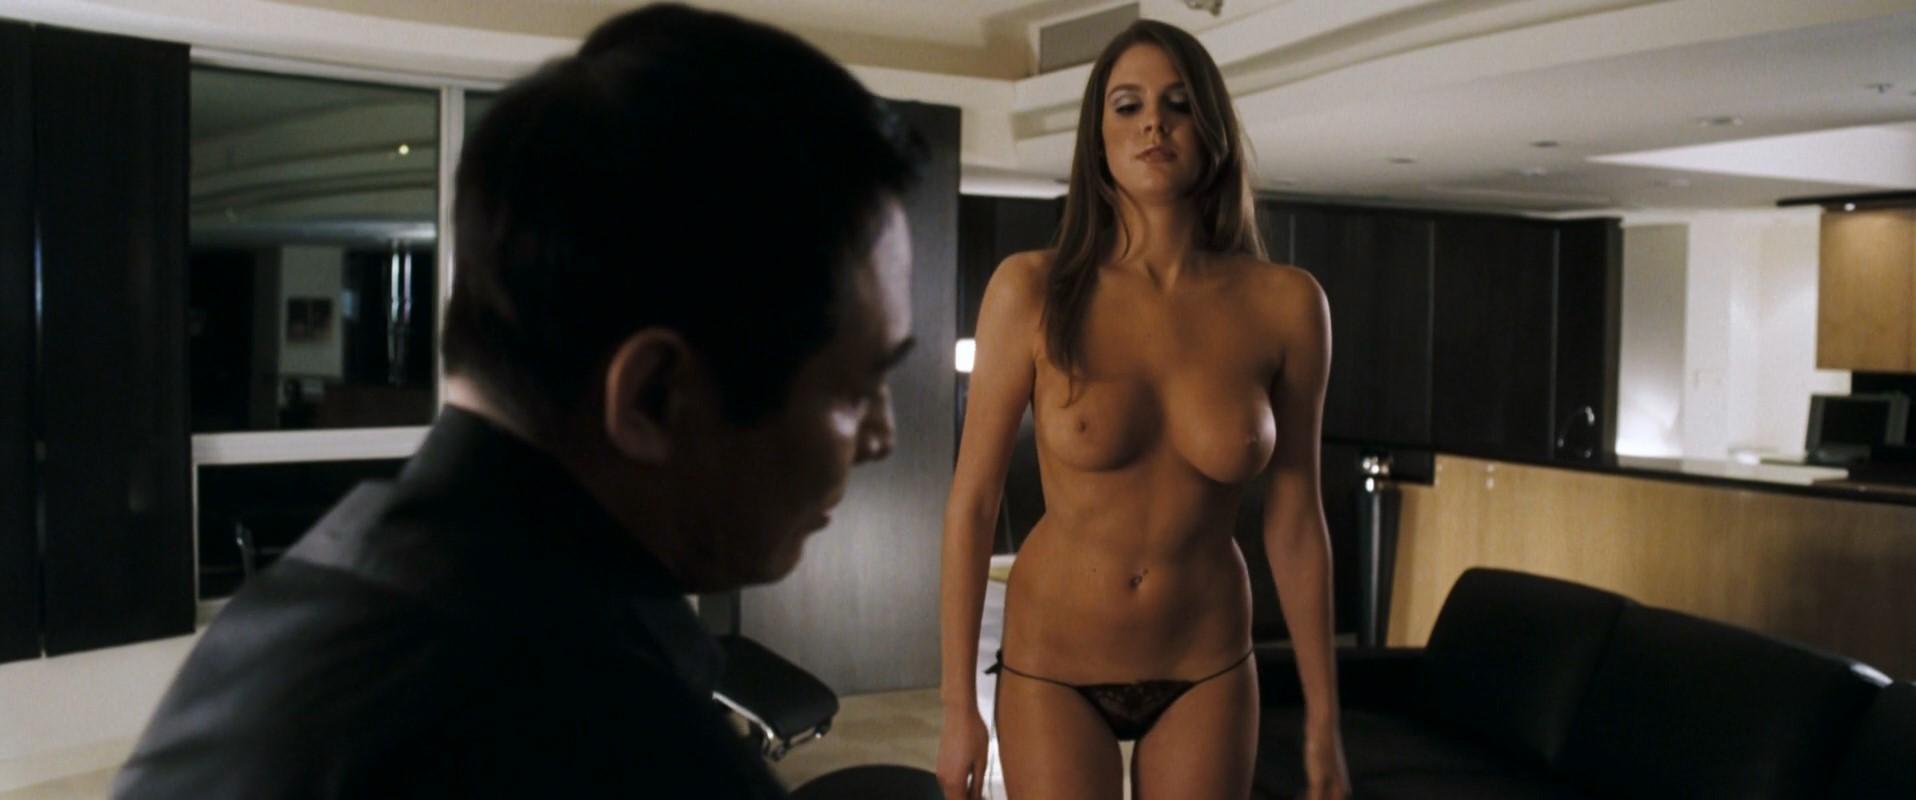 Meghan flather nude war 2007 hd